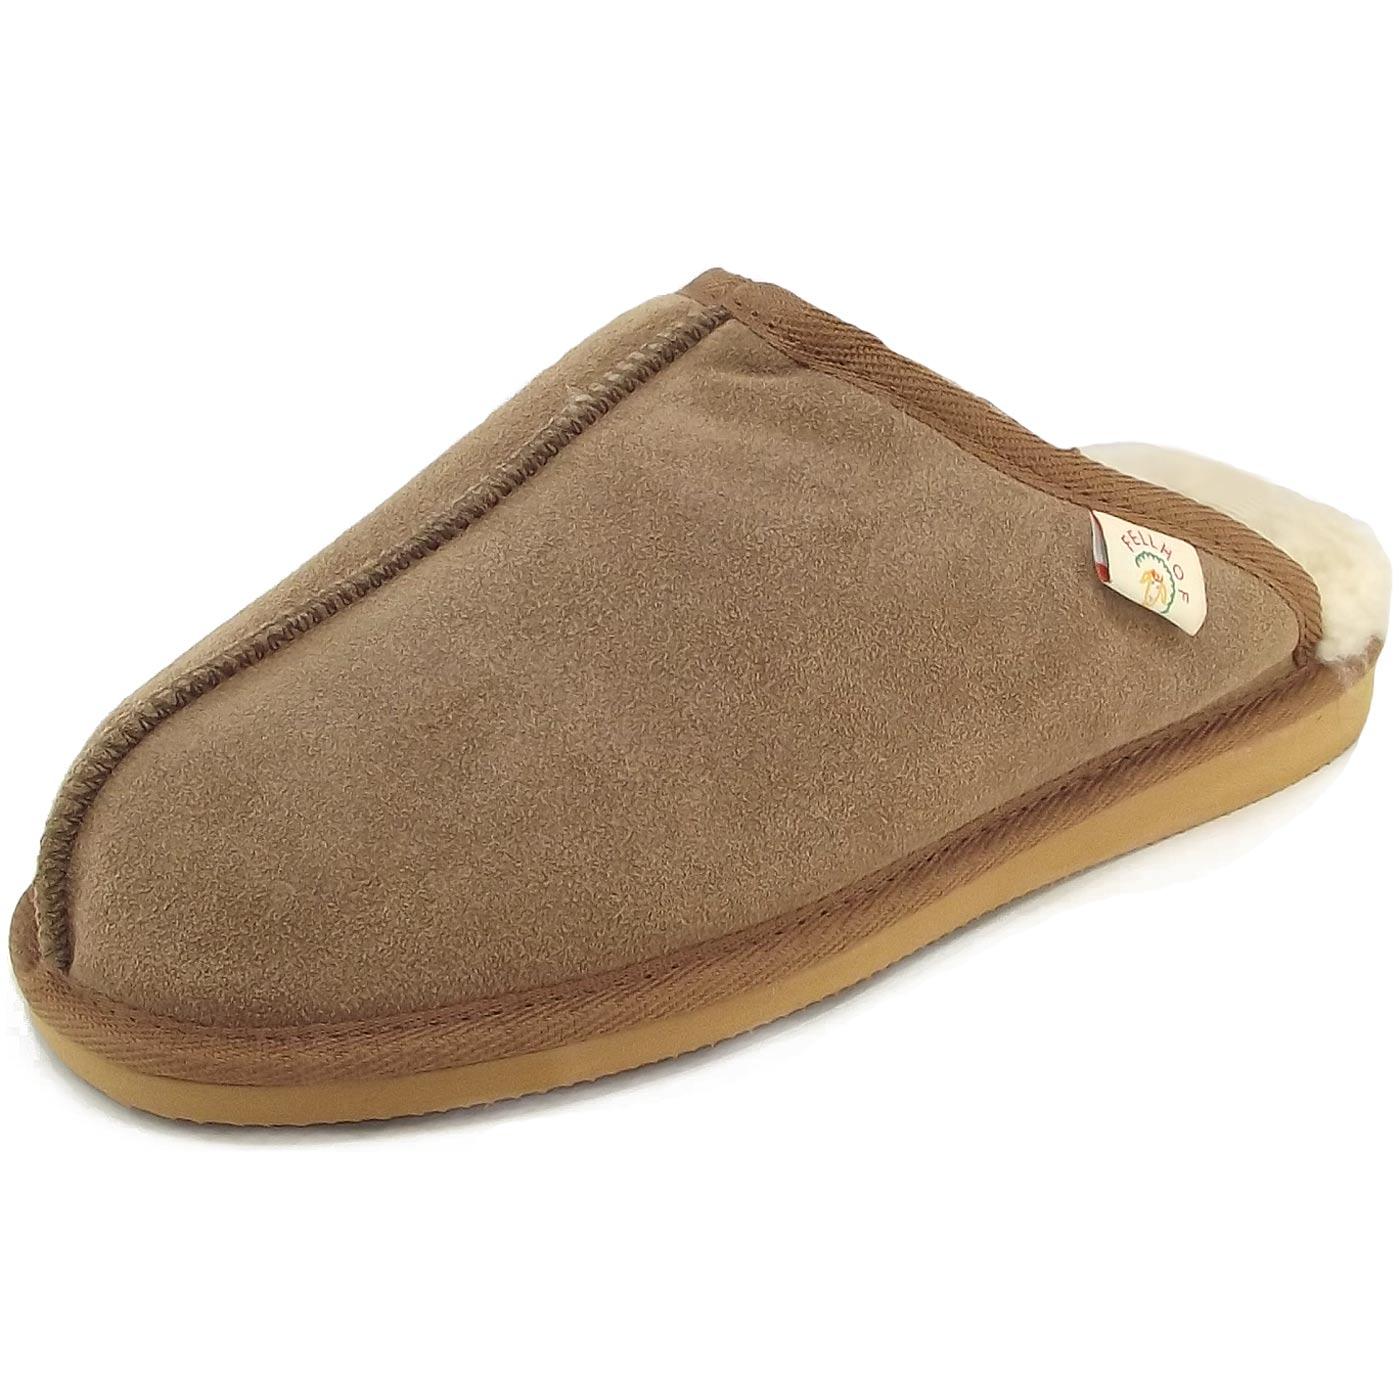 fellhof unico unisex lammfell pantoffel chestnut pantoffeln damen hausschuhe haus schuhe. Black Bedroom Furniture Sets. Home Design Ideas